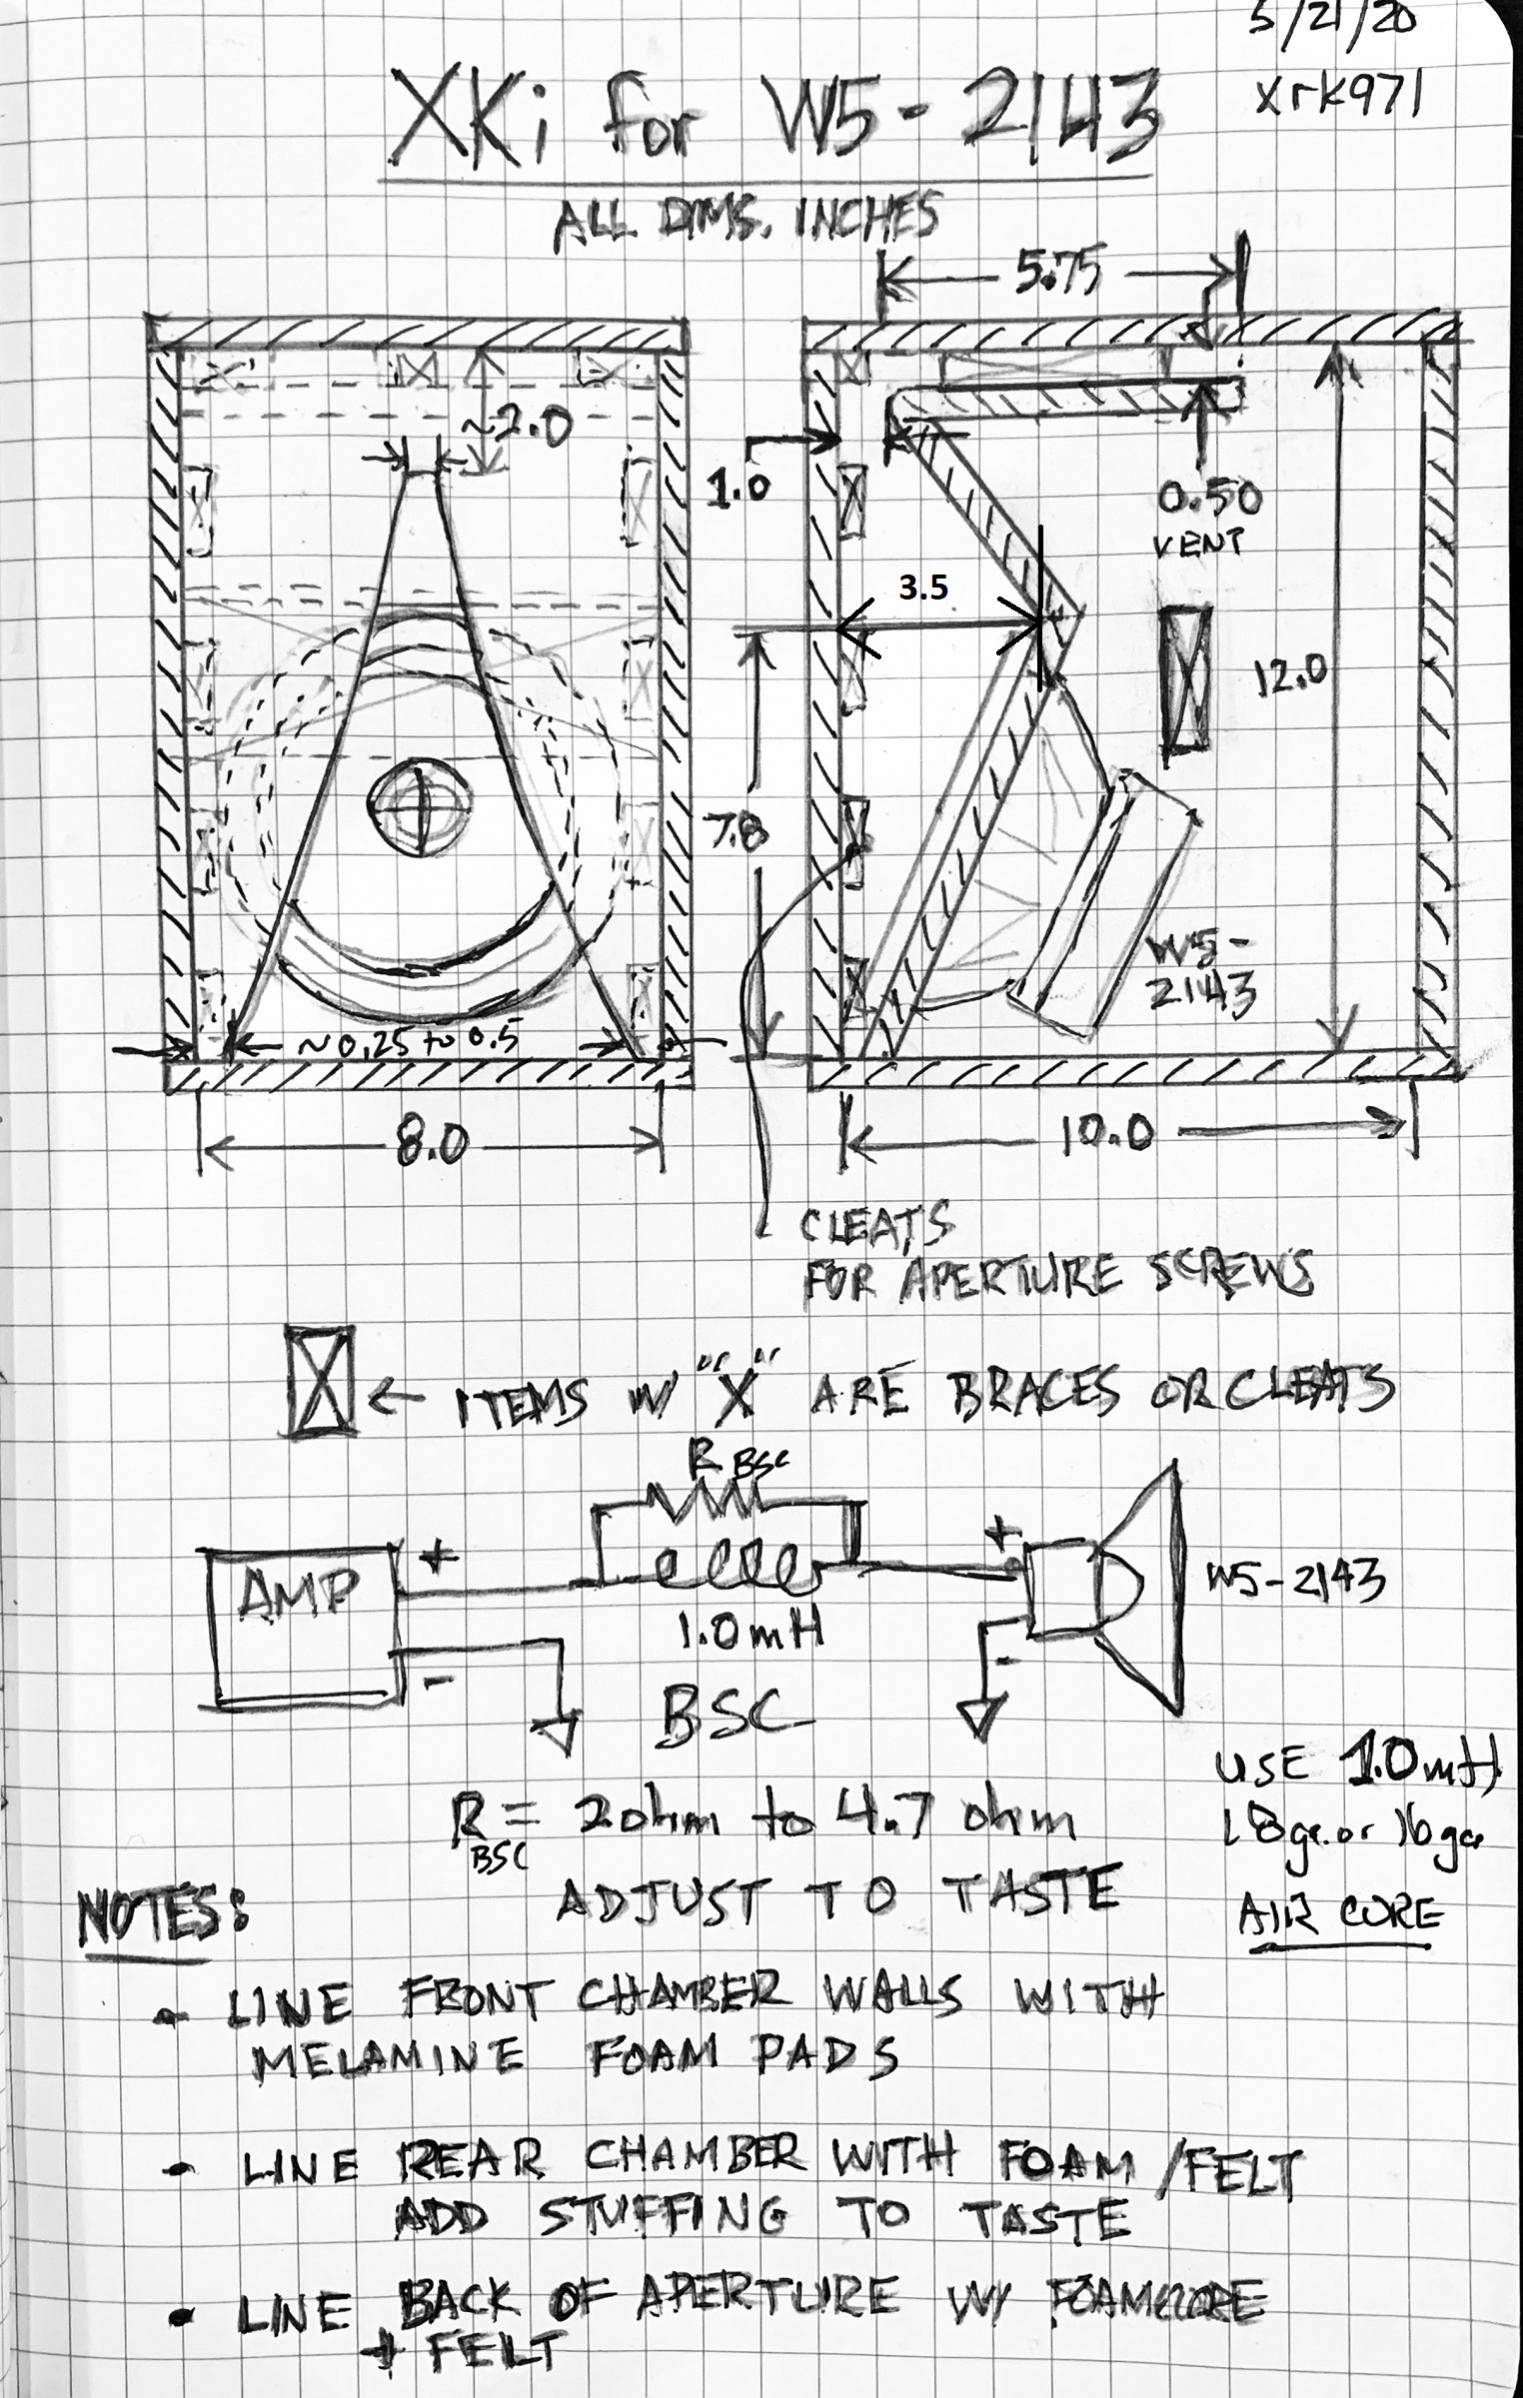 XKi - X's ab initio Karlson 6th Order Bandpass-xki-w5-2143-plans-xrk971-21-2020-jpg